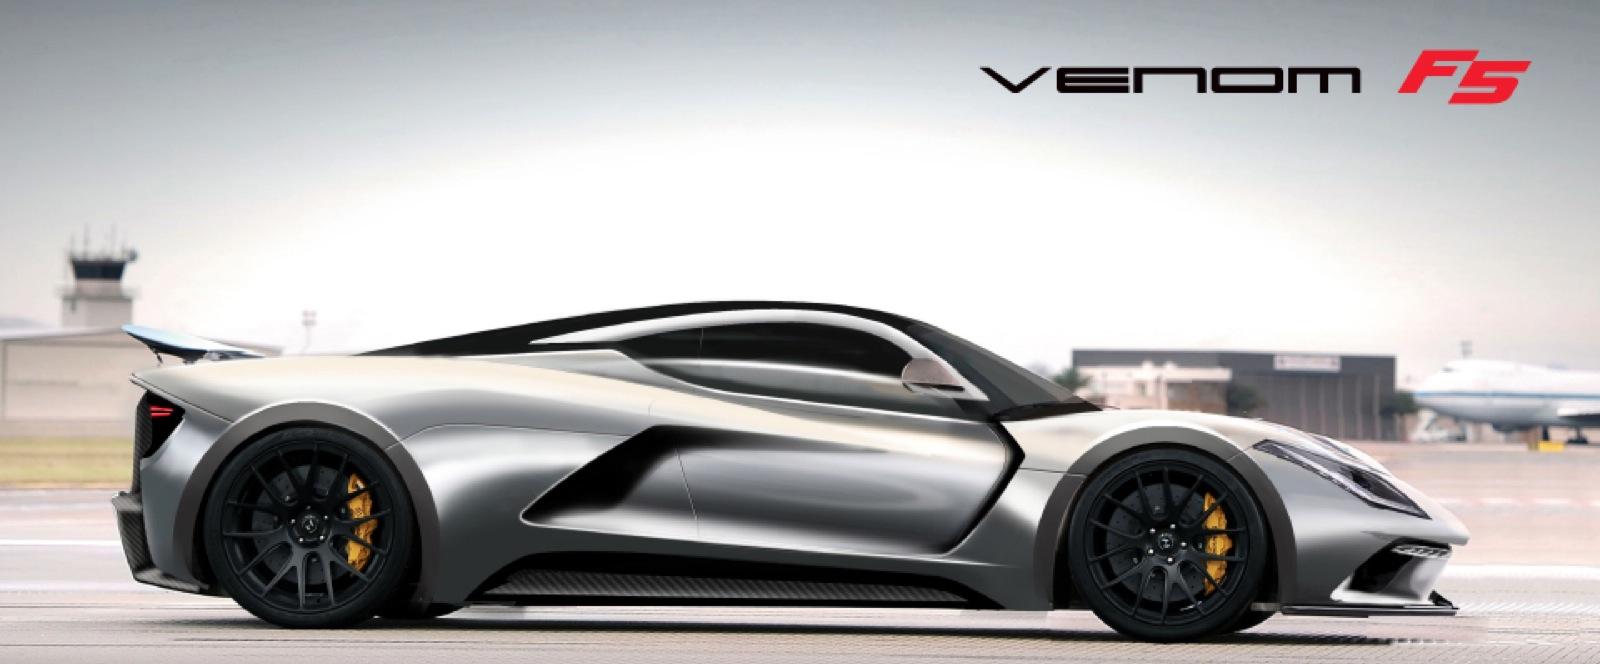 New hypercars - 1500 hp Hennessy Venom GT2 and 1400 hp Koenigsegg ...